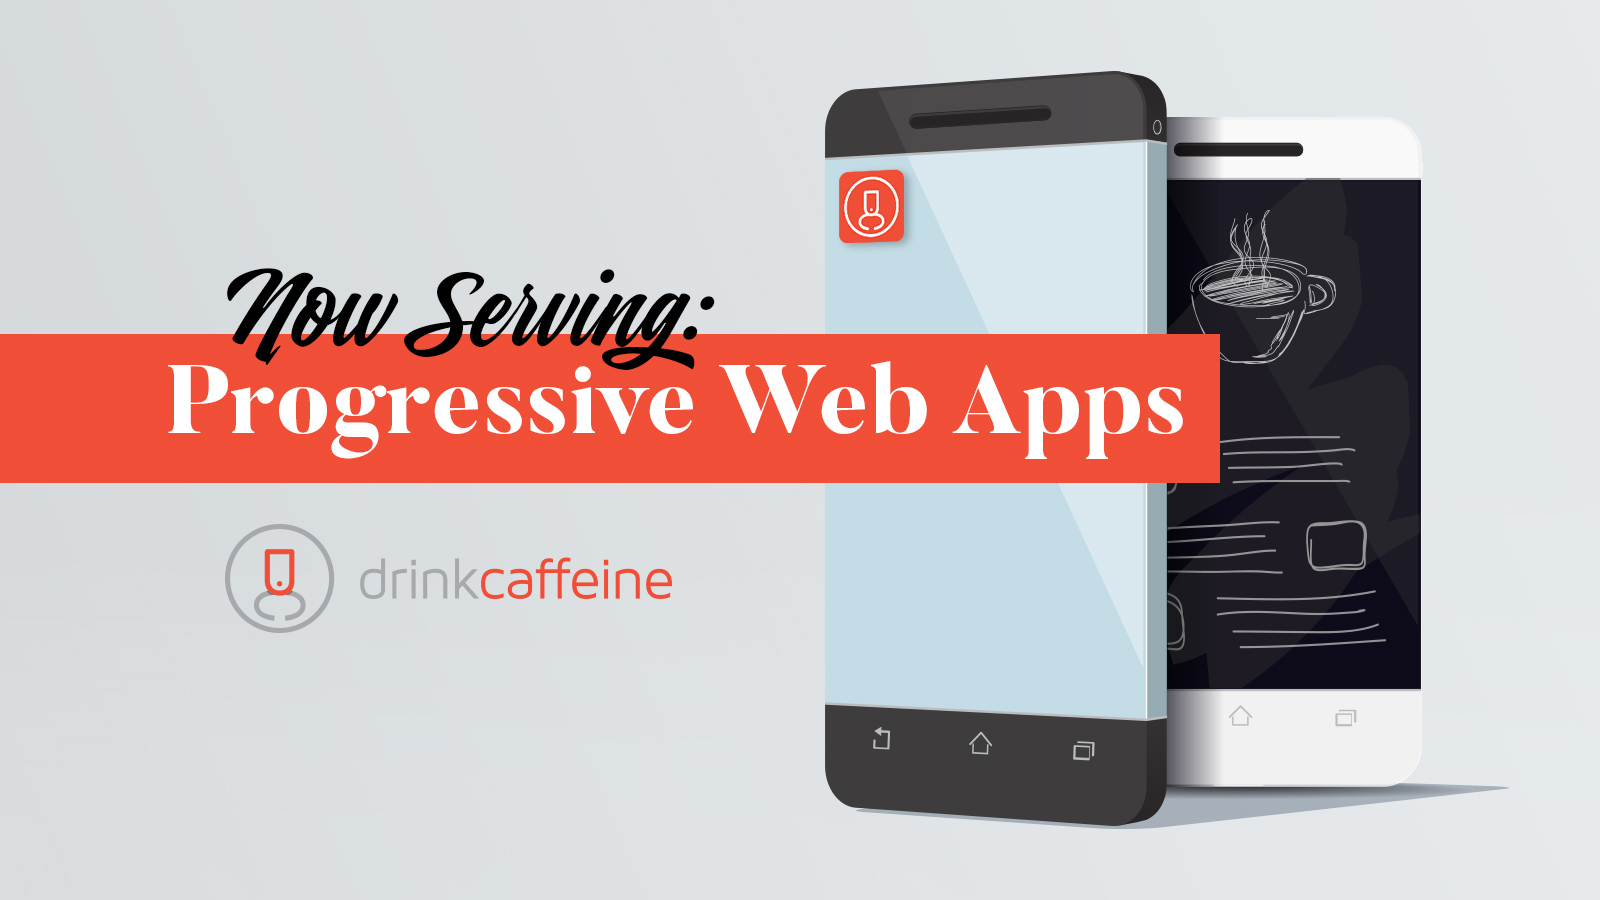 Progressive web apps now being served blog image